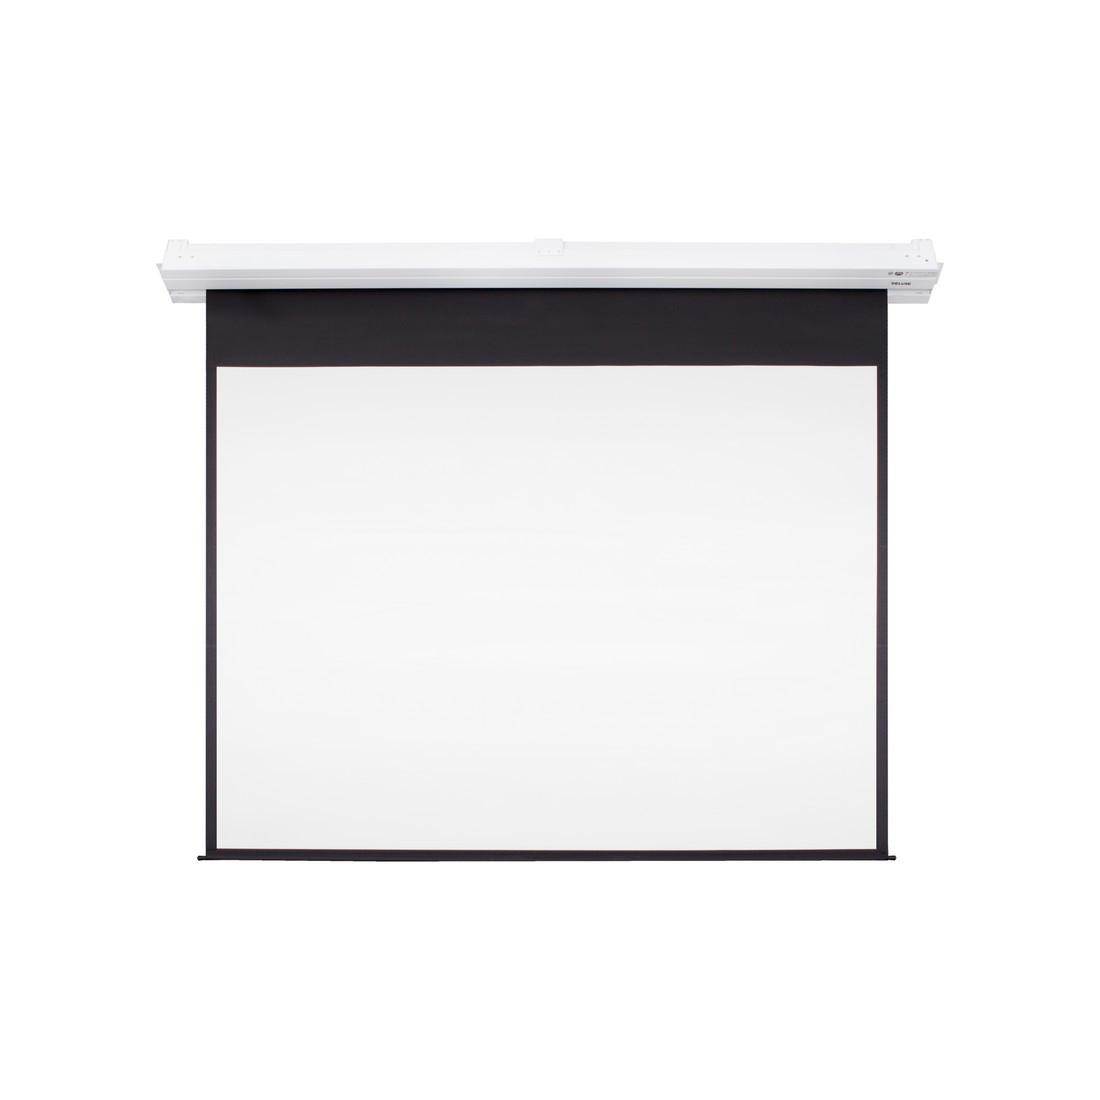 "Встраиваемый экран Deluxe DLS-I244-183 (96""х72""), Ø - 120"", Раб. поверхность 236x175 см., 4:3"